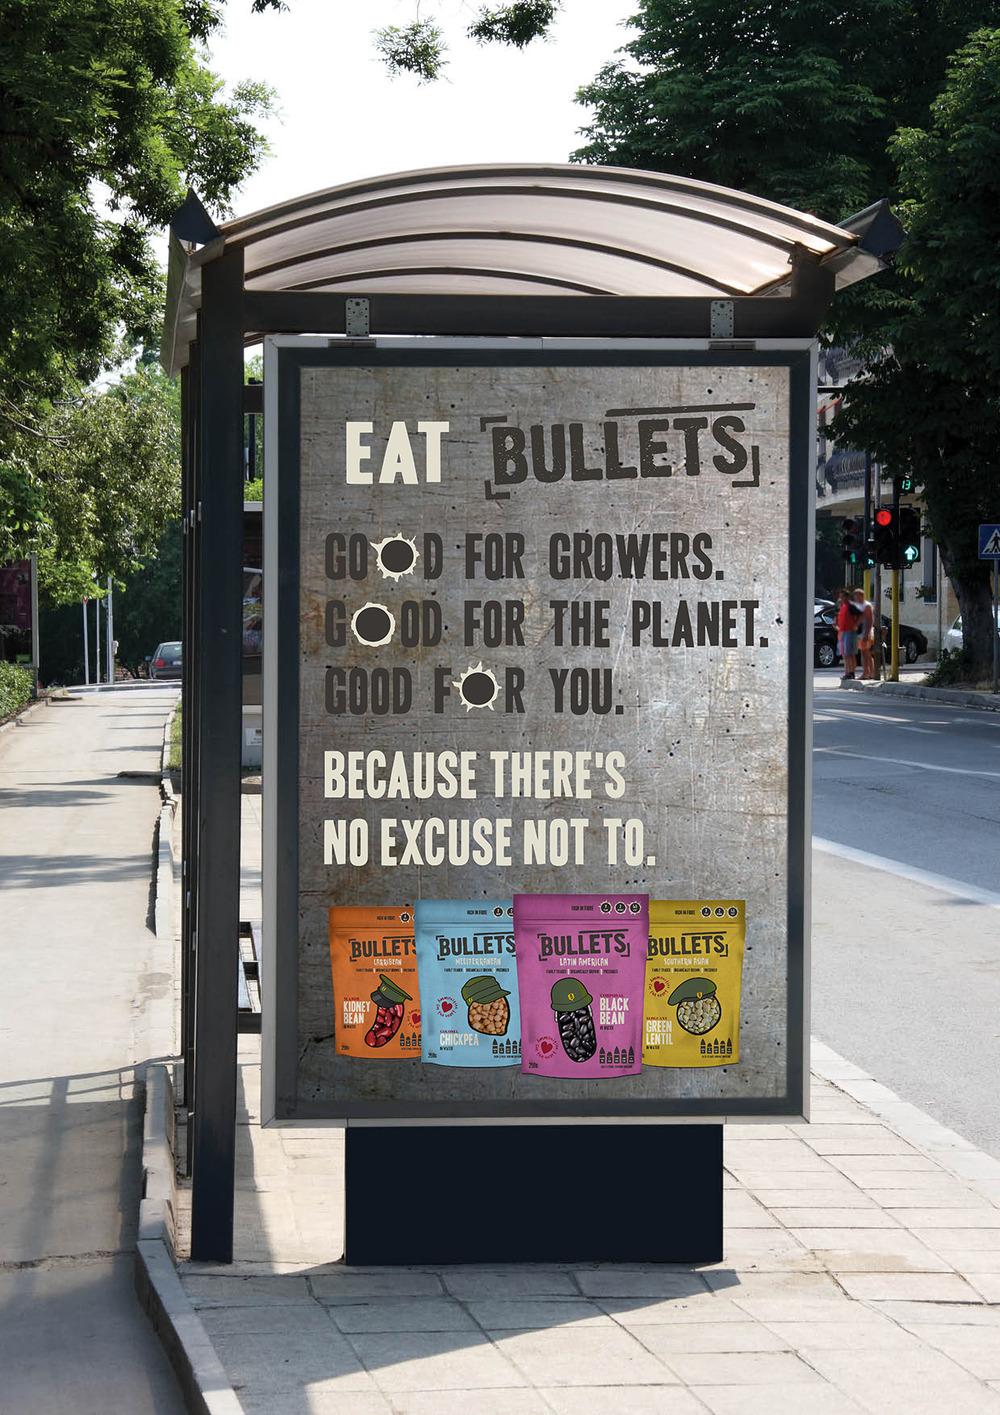 Gemma_Cormack-Bullets_Poster_Bus_Shelter.jpg